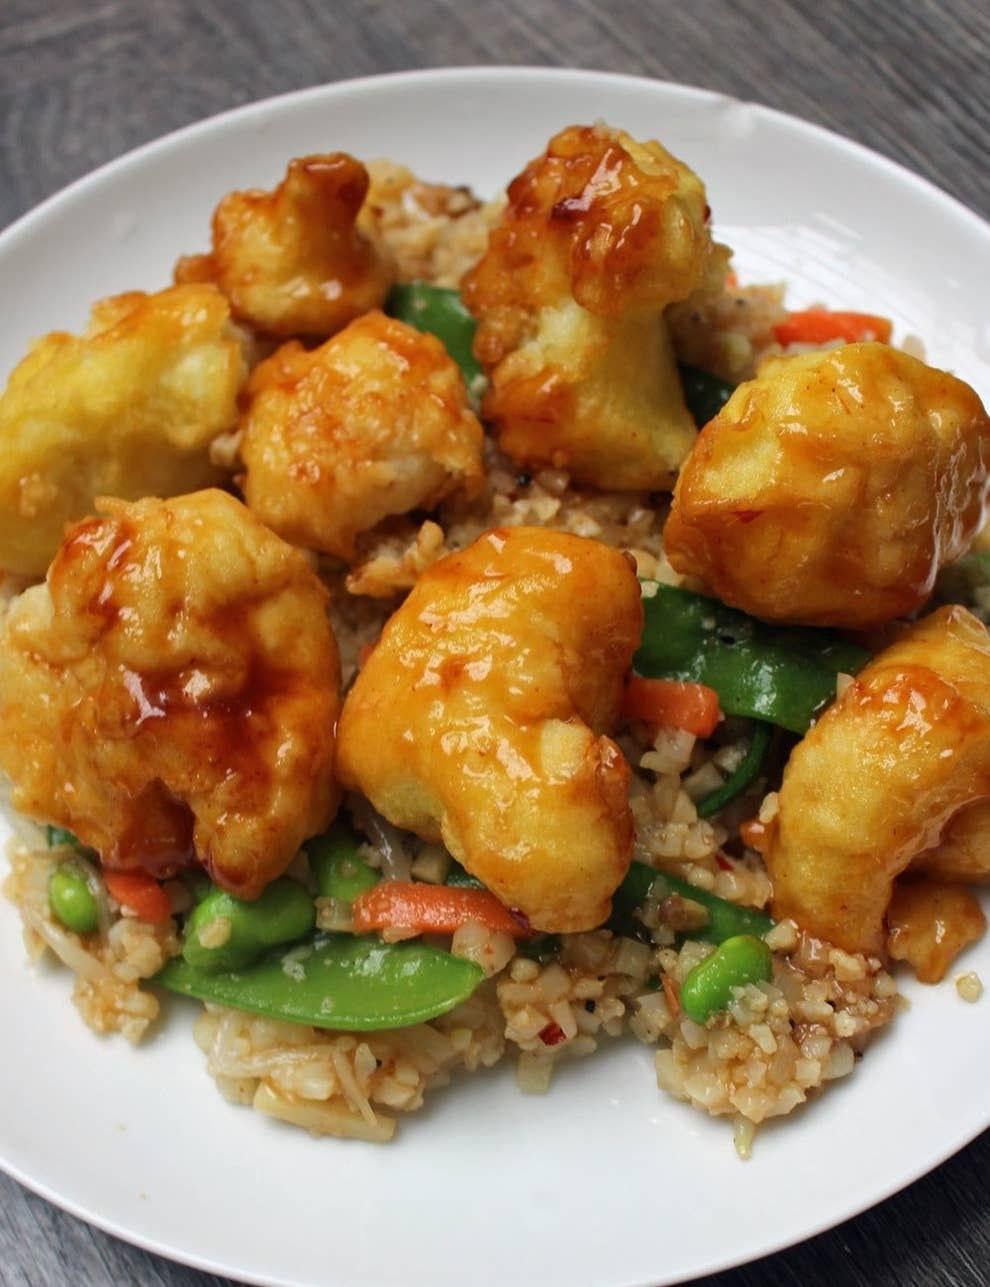 A plate of crispy tempura cauliflower on top of stir fried veggies and cauliflower rice.